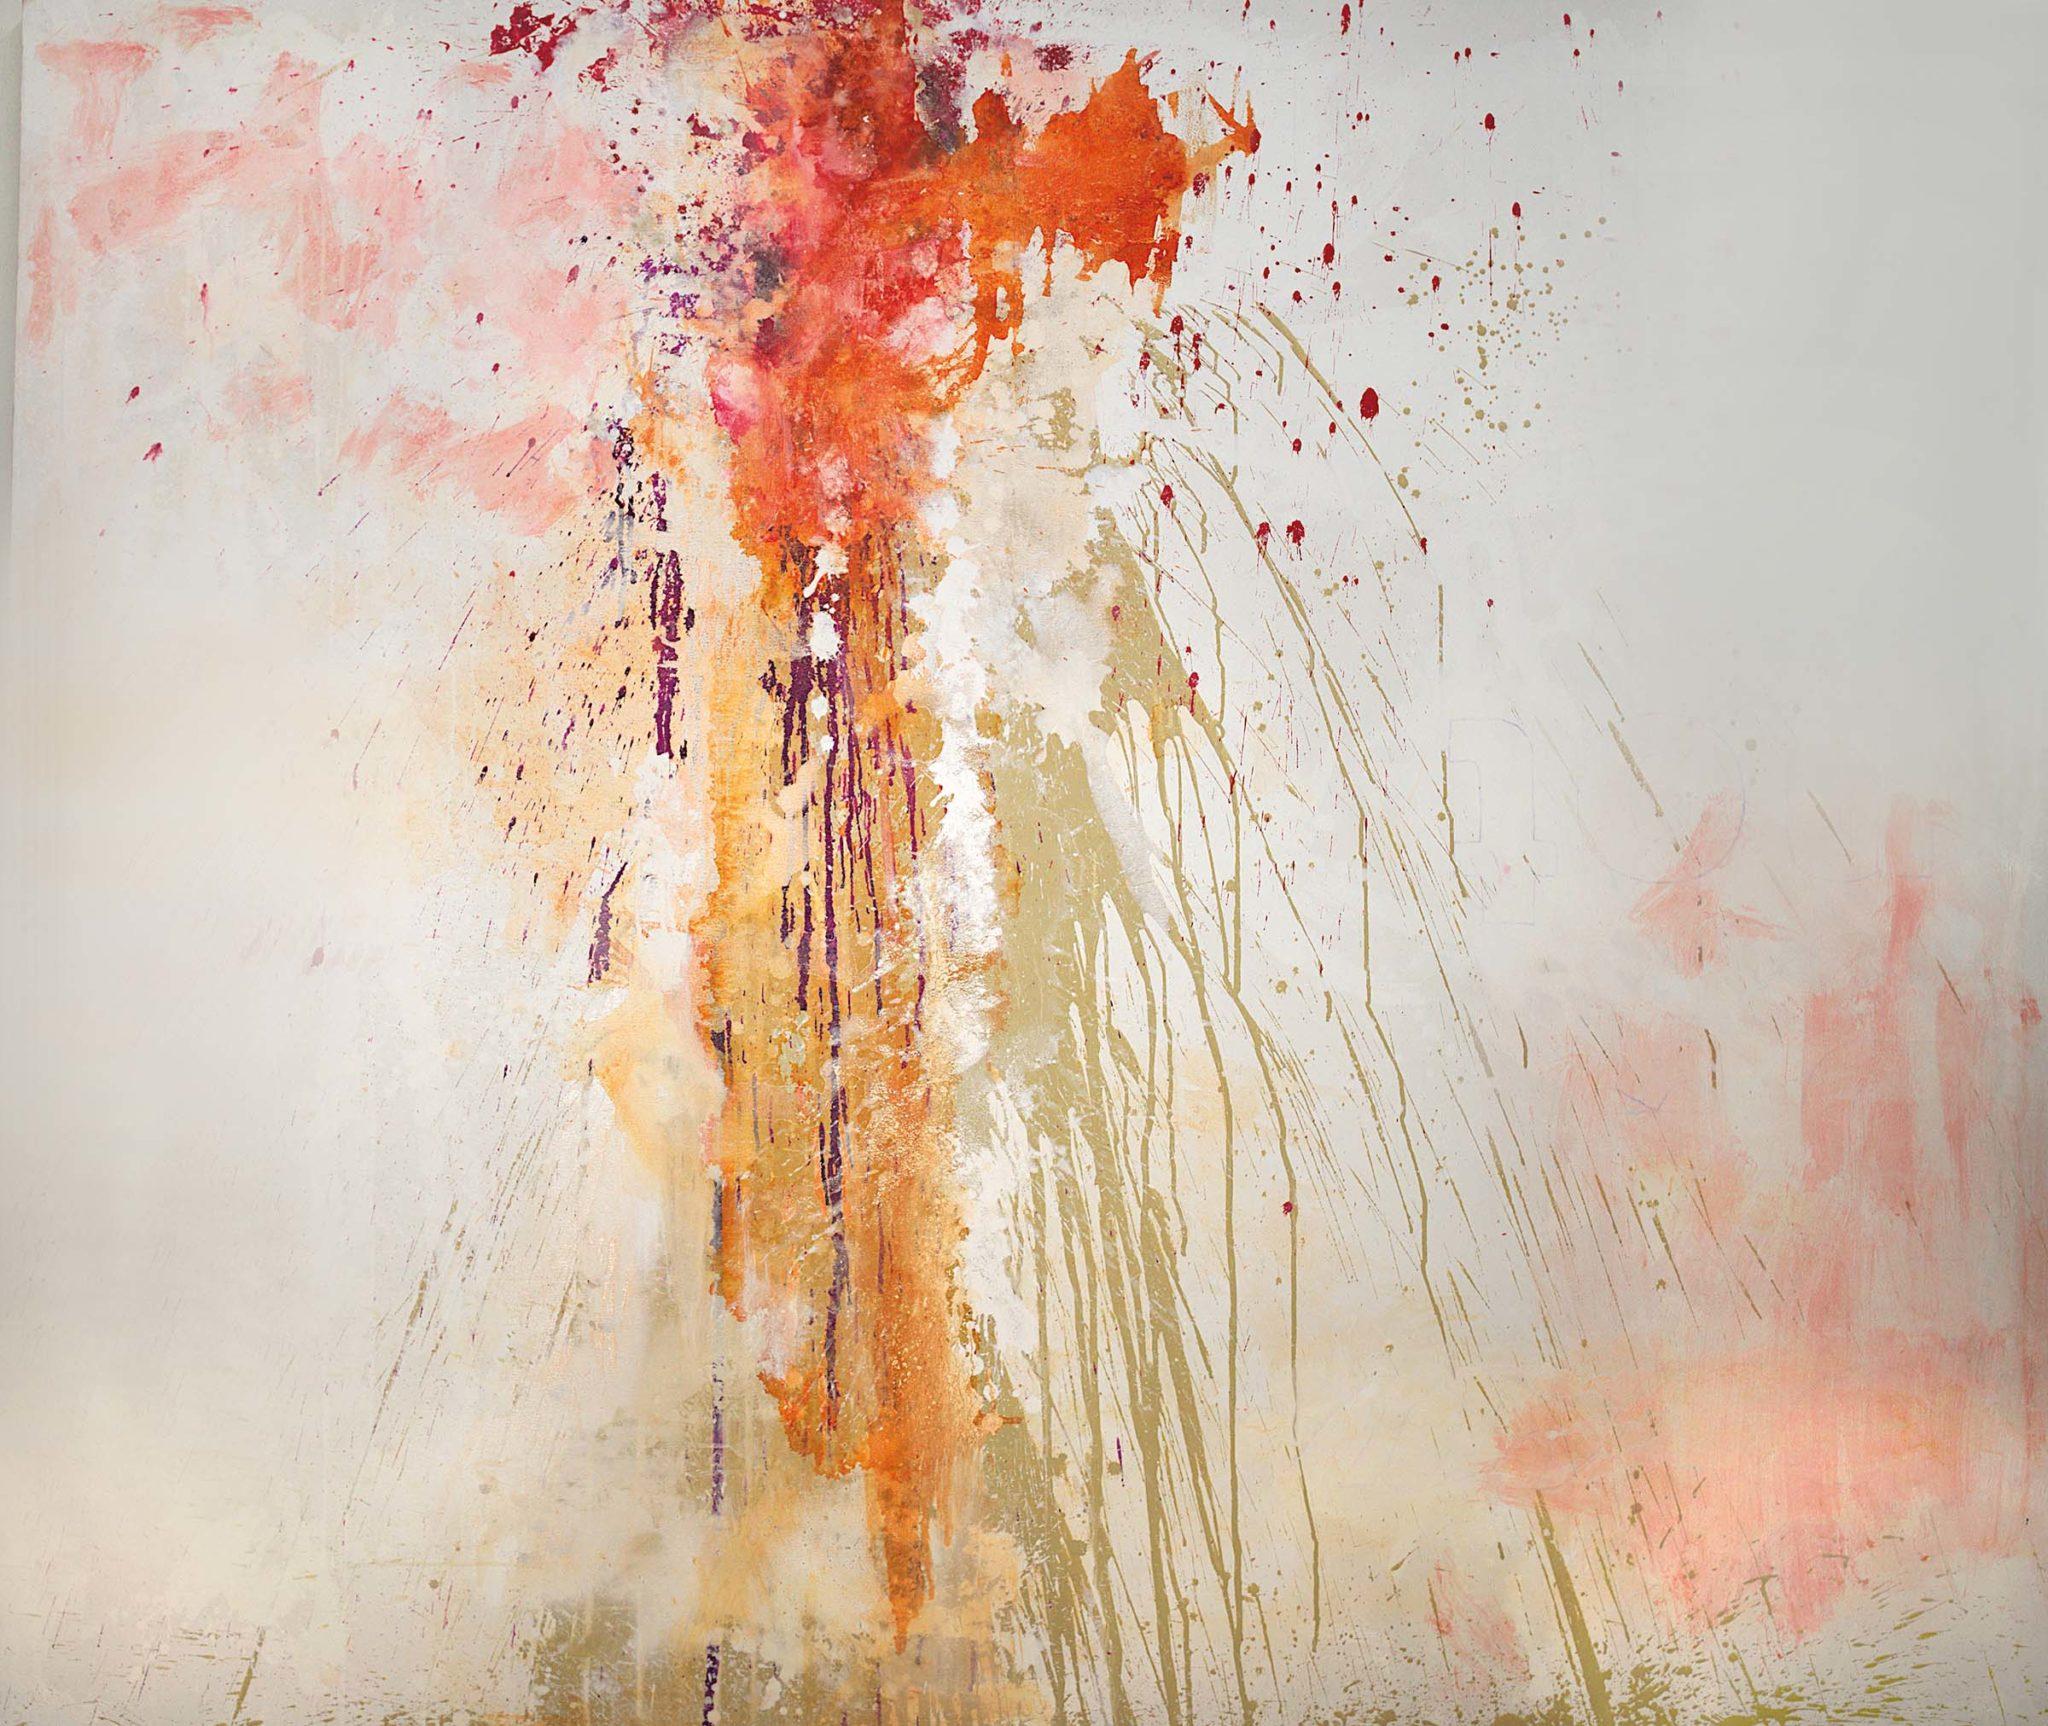 19. Januar bis 29. März 2020 Galerie CARLSART 78 – »AT3M «